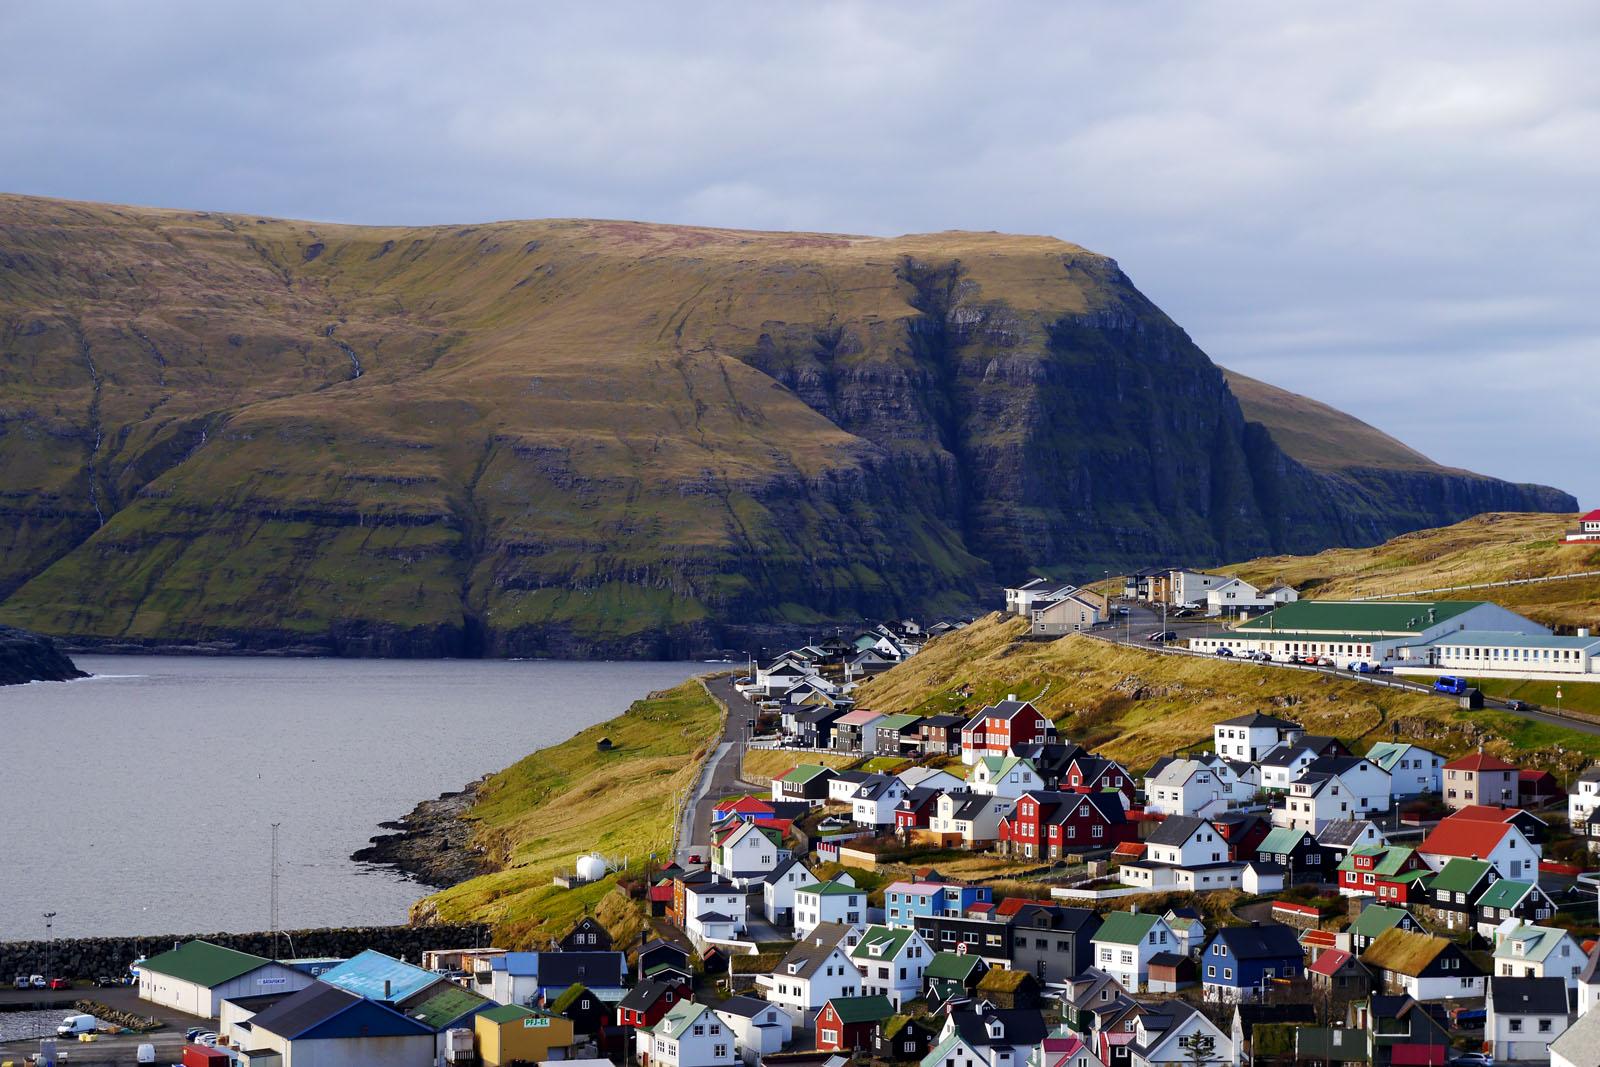 Eidi-Faroer Inseln-Eysturoy-Klippe-Berge-bunte Häuser